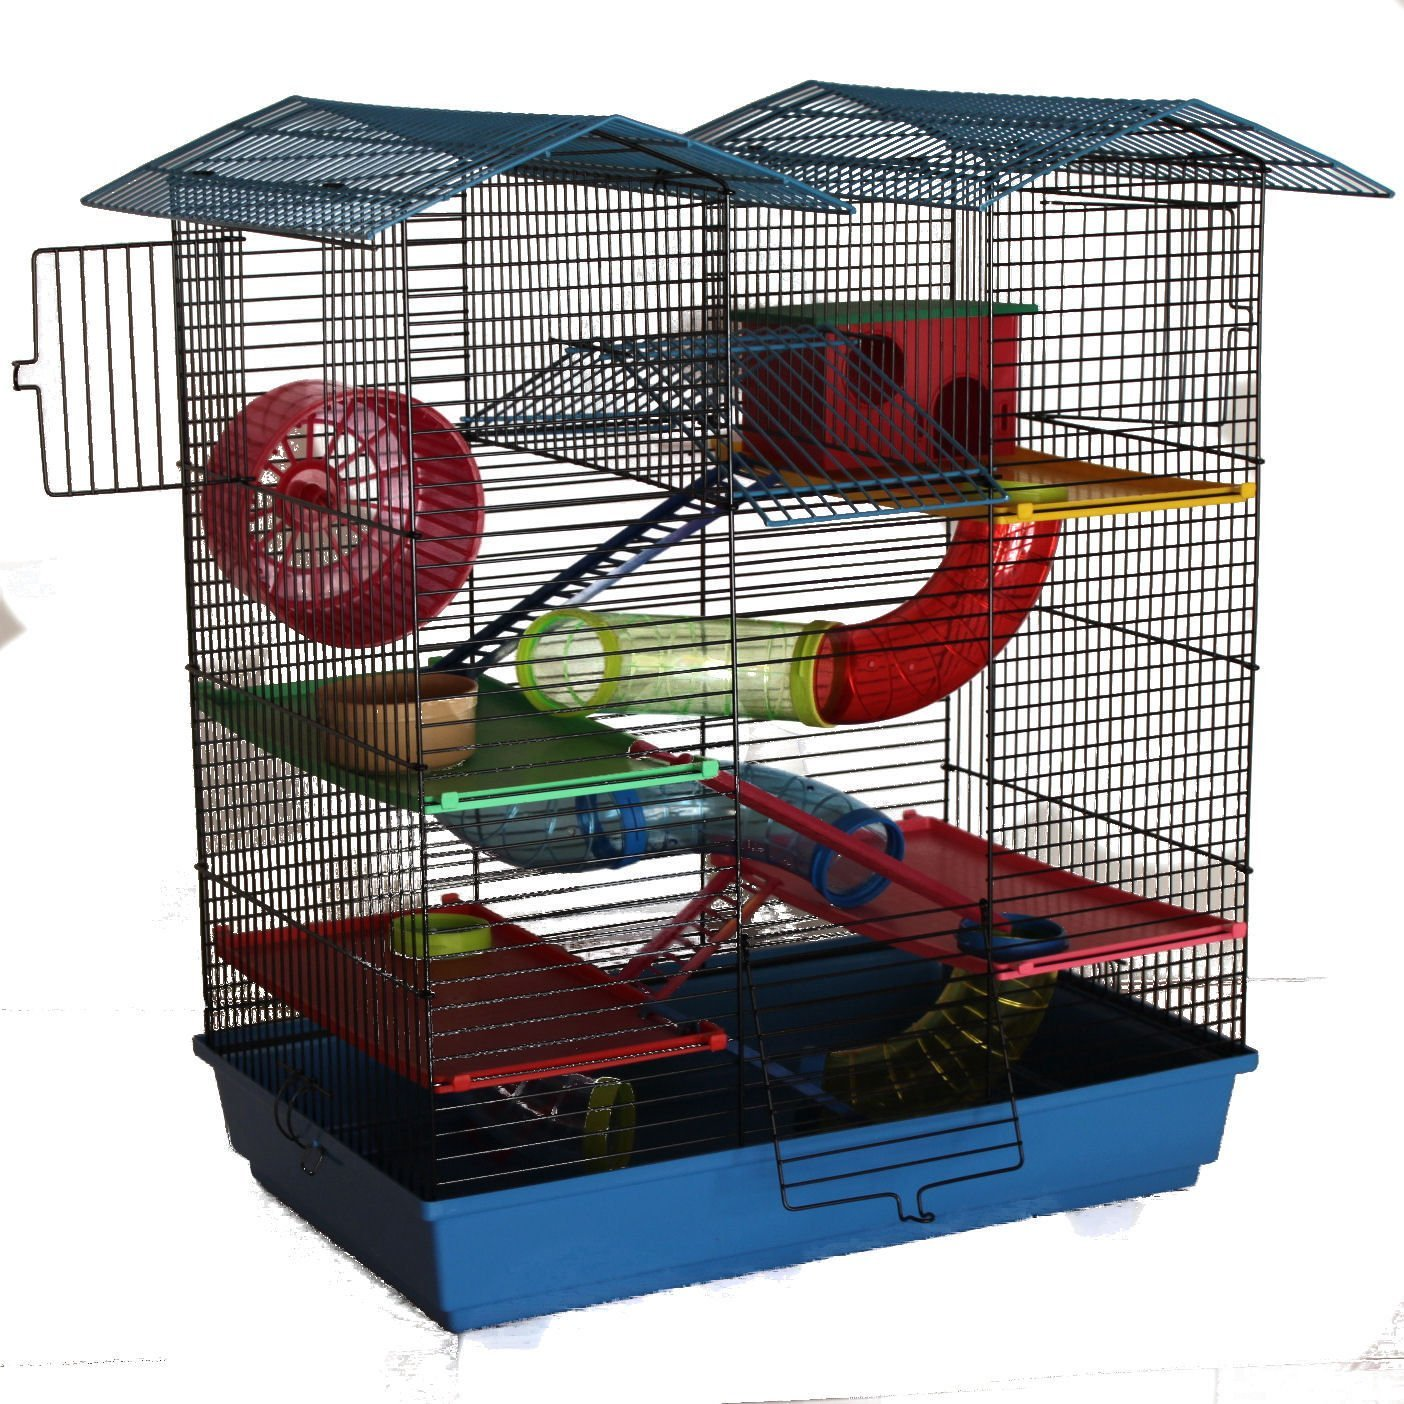 Hamsterkäfig mit Gitter und Röhrensystem